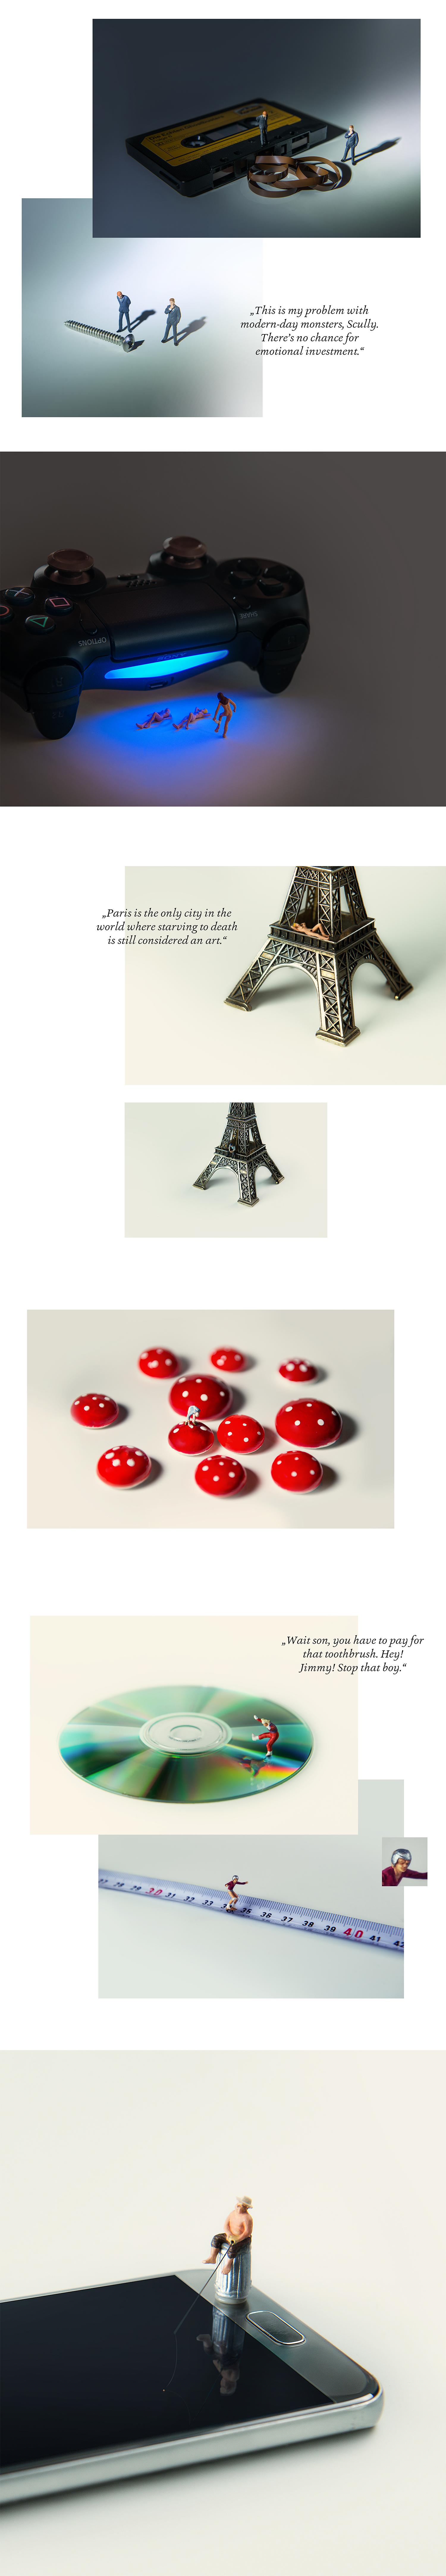 LITTLEONES-03-WEB